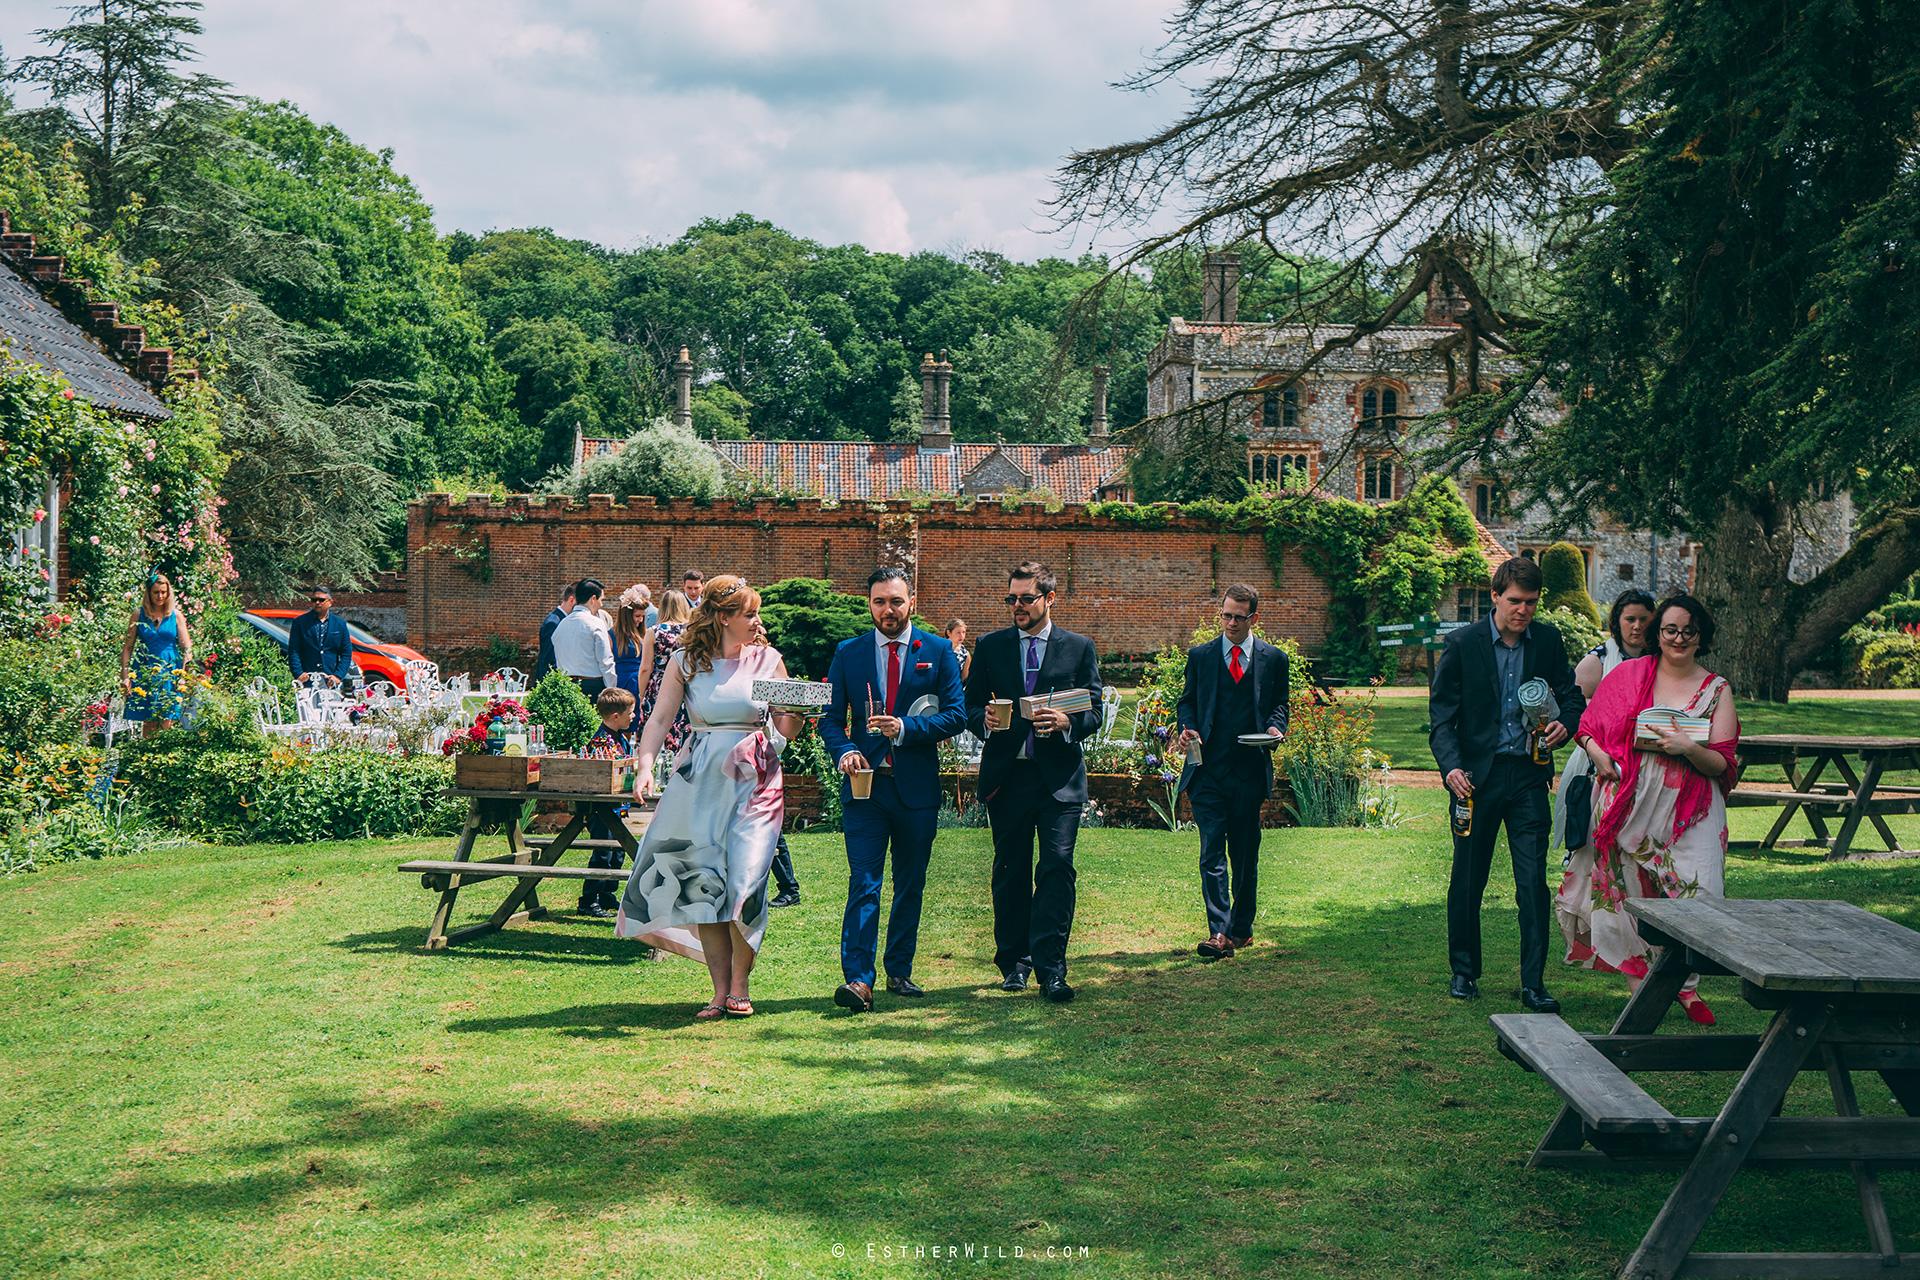 Norfolk_Wedding_Photographer_Mannington_Hall_Country_Esther_Wild_0432.jpg